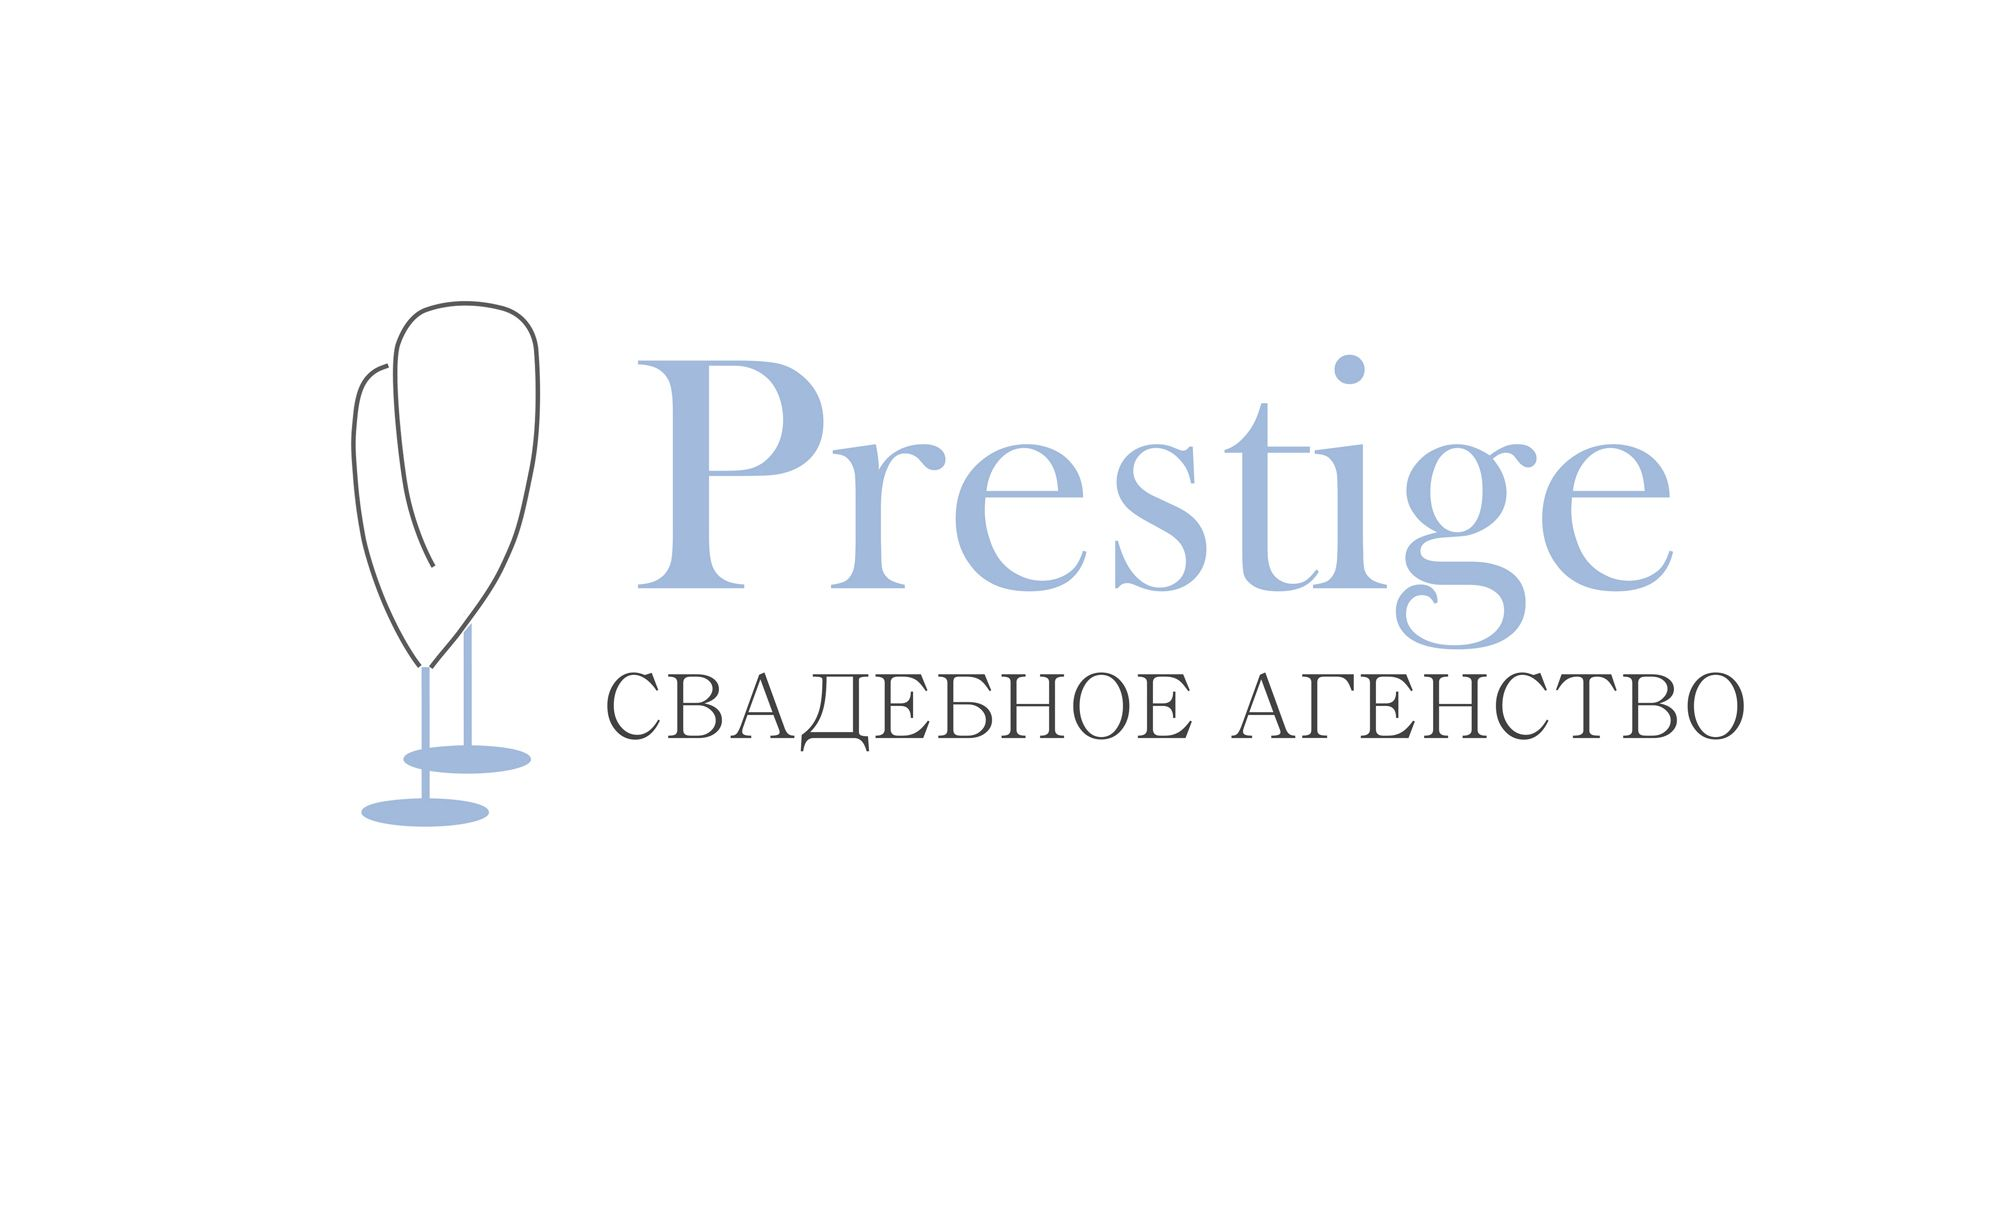 Логотип для свадебного агентства Prestige - дизайнер Zveole